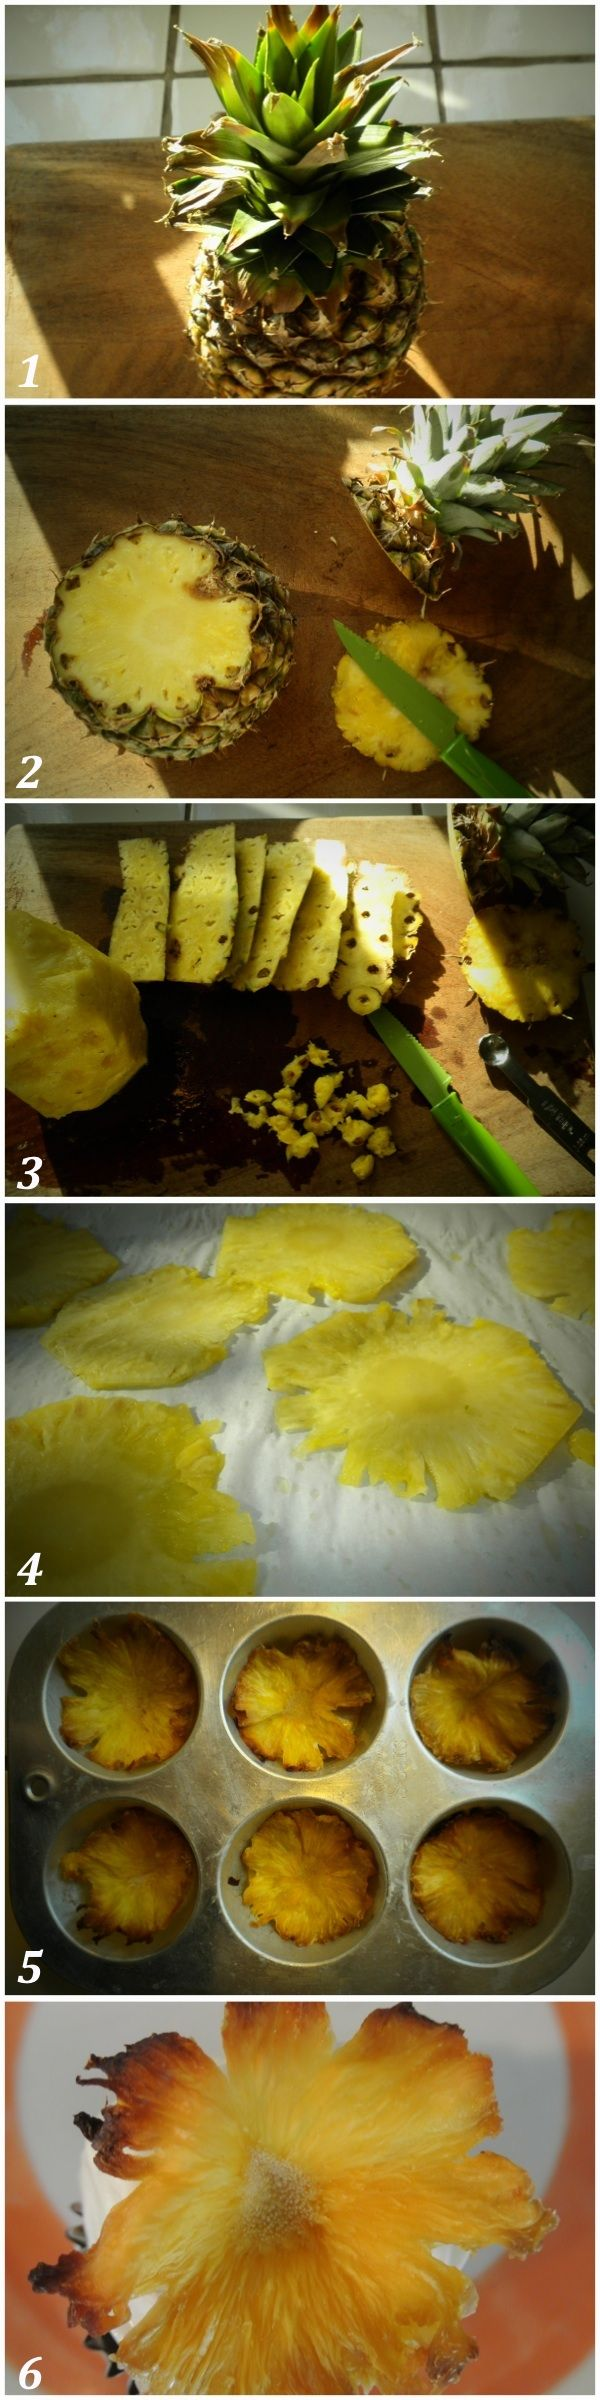 dried pineapple flowers recipe. | Recipeasy-Lemon-Squeezy | Pinterest